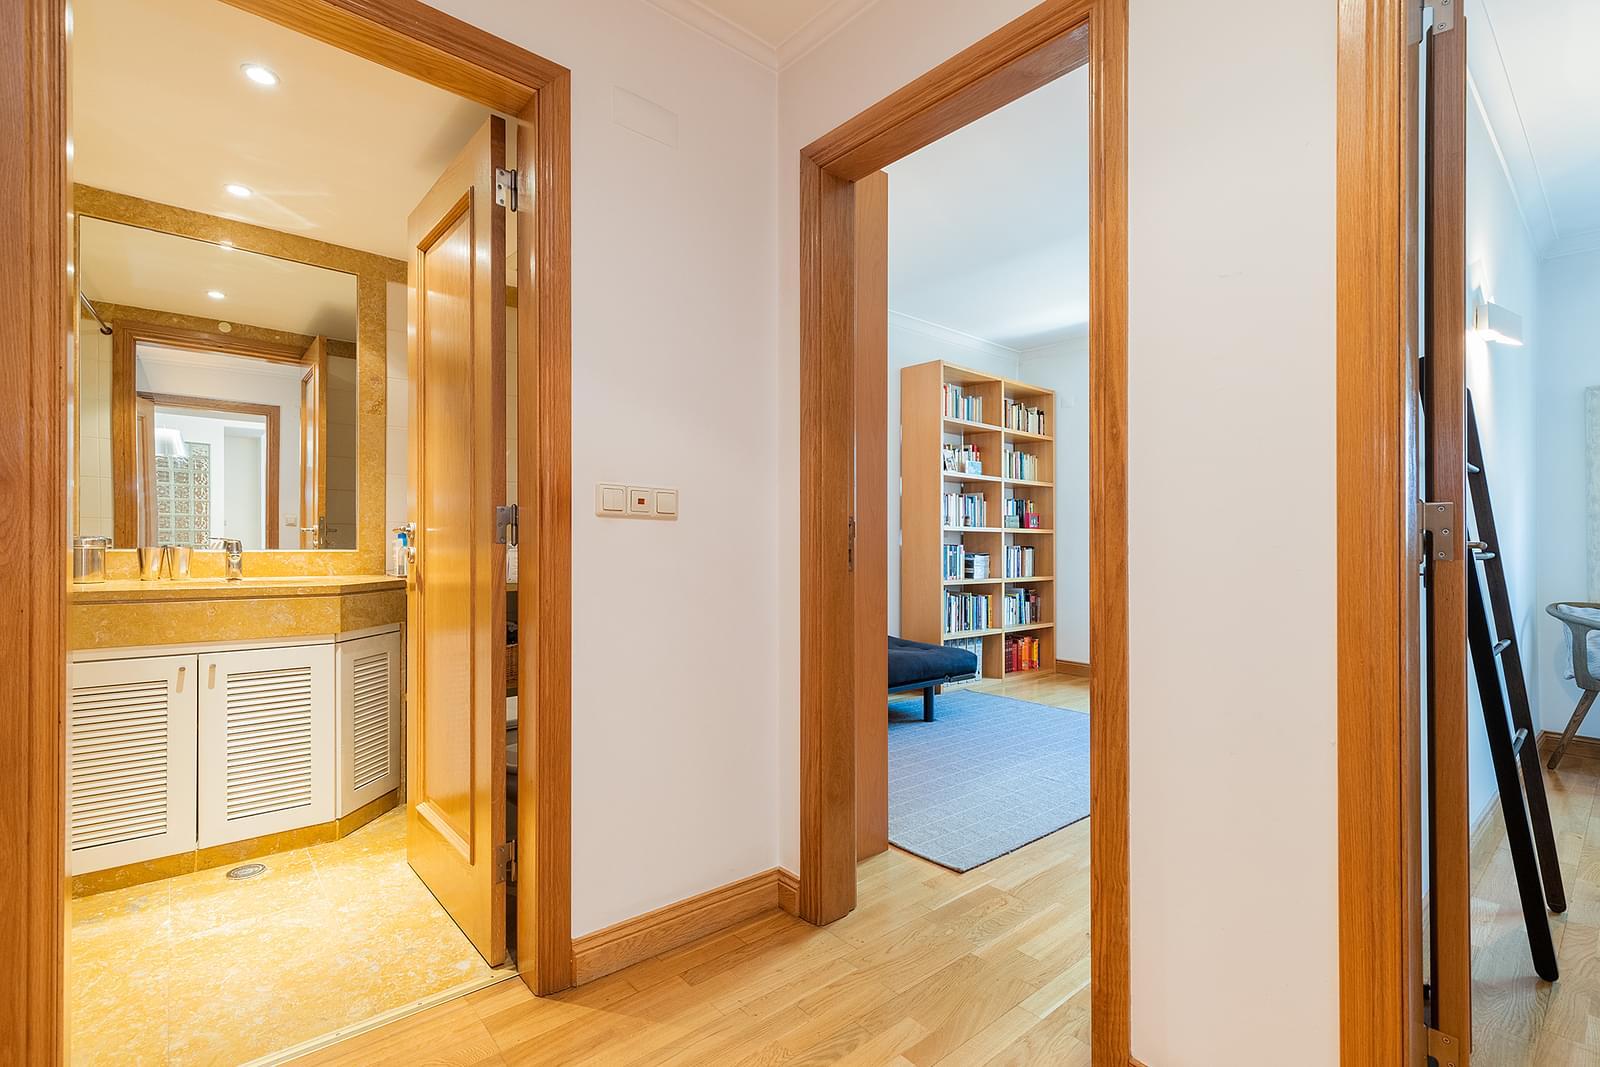 pf18967-apartamento-t2-lisboa-458b4111-3327-4062-87c9-44811996bb28